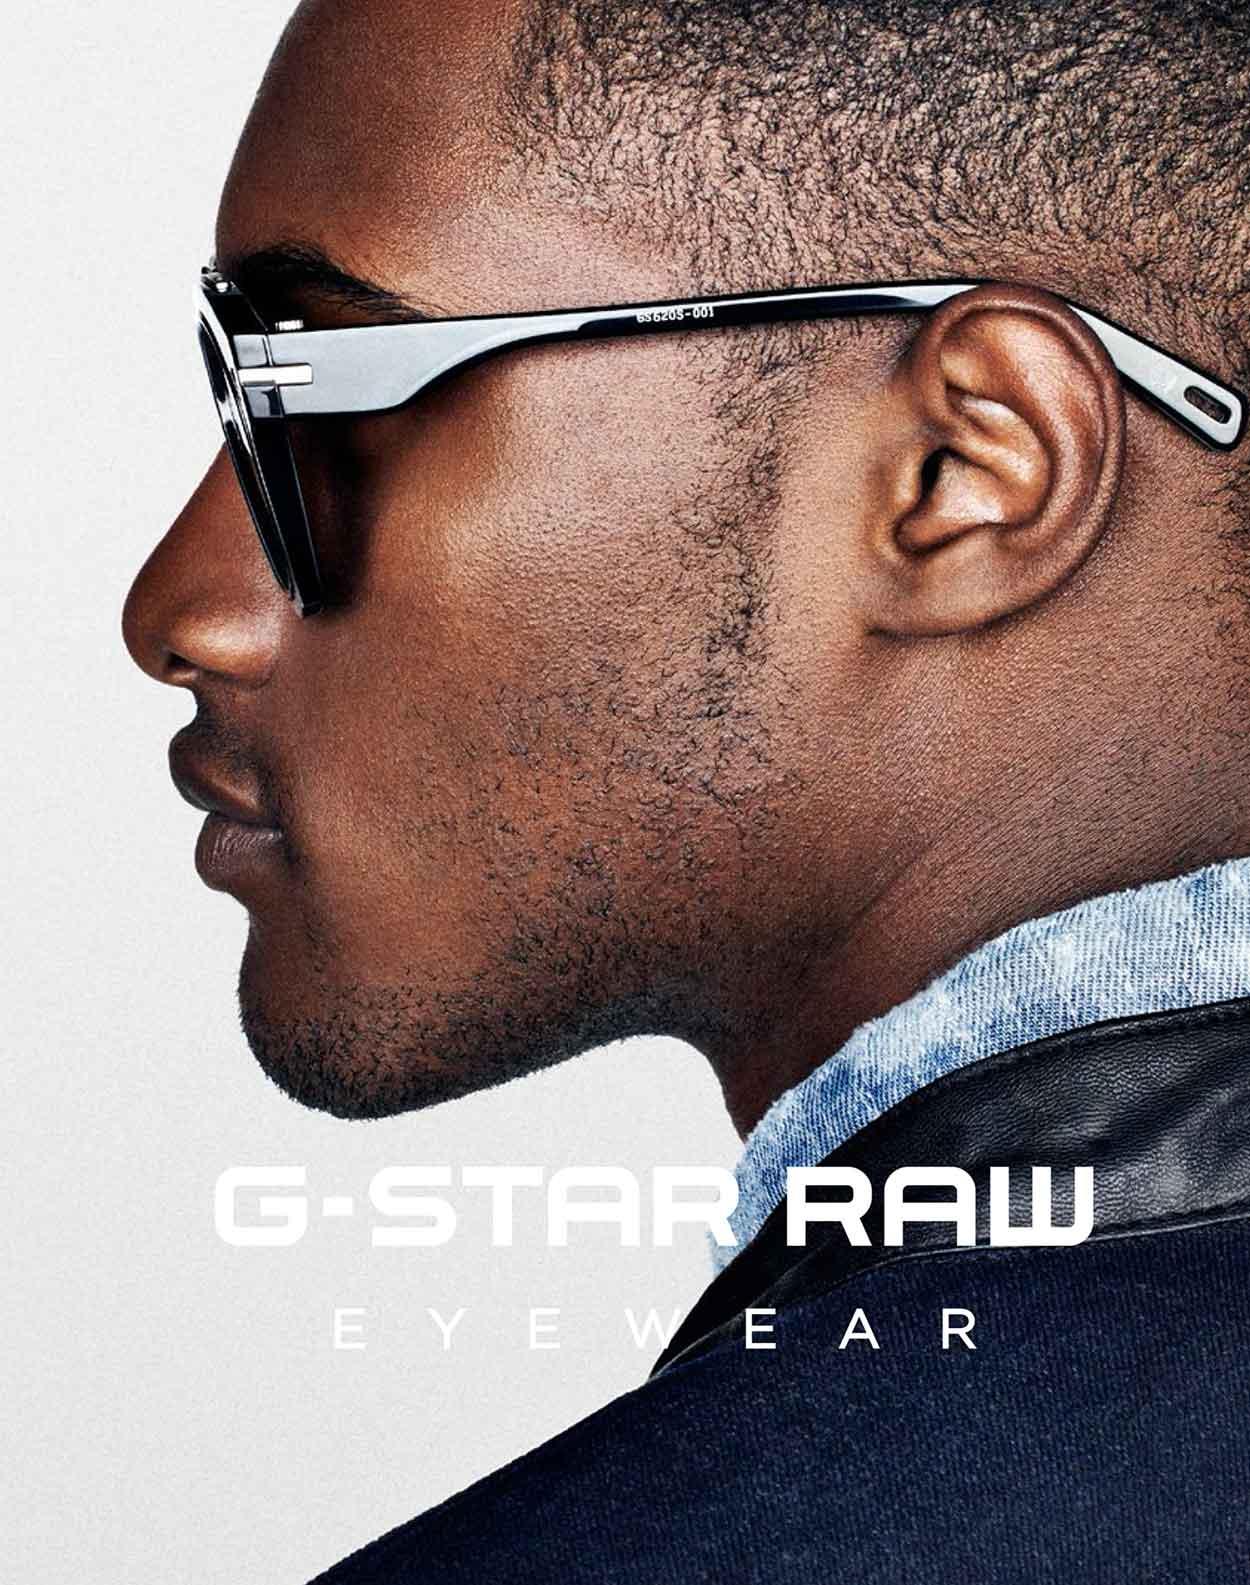 G-Star Eyewear